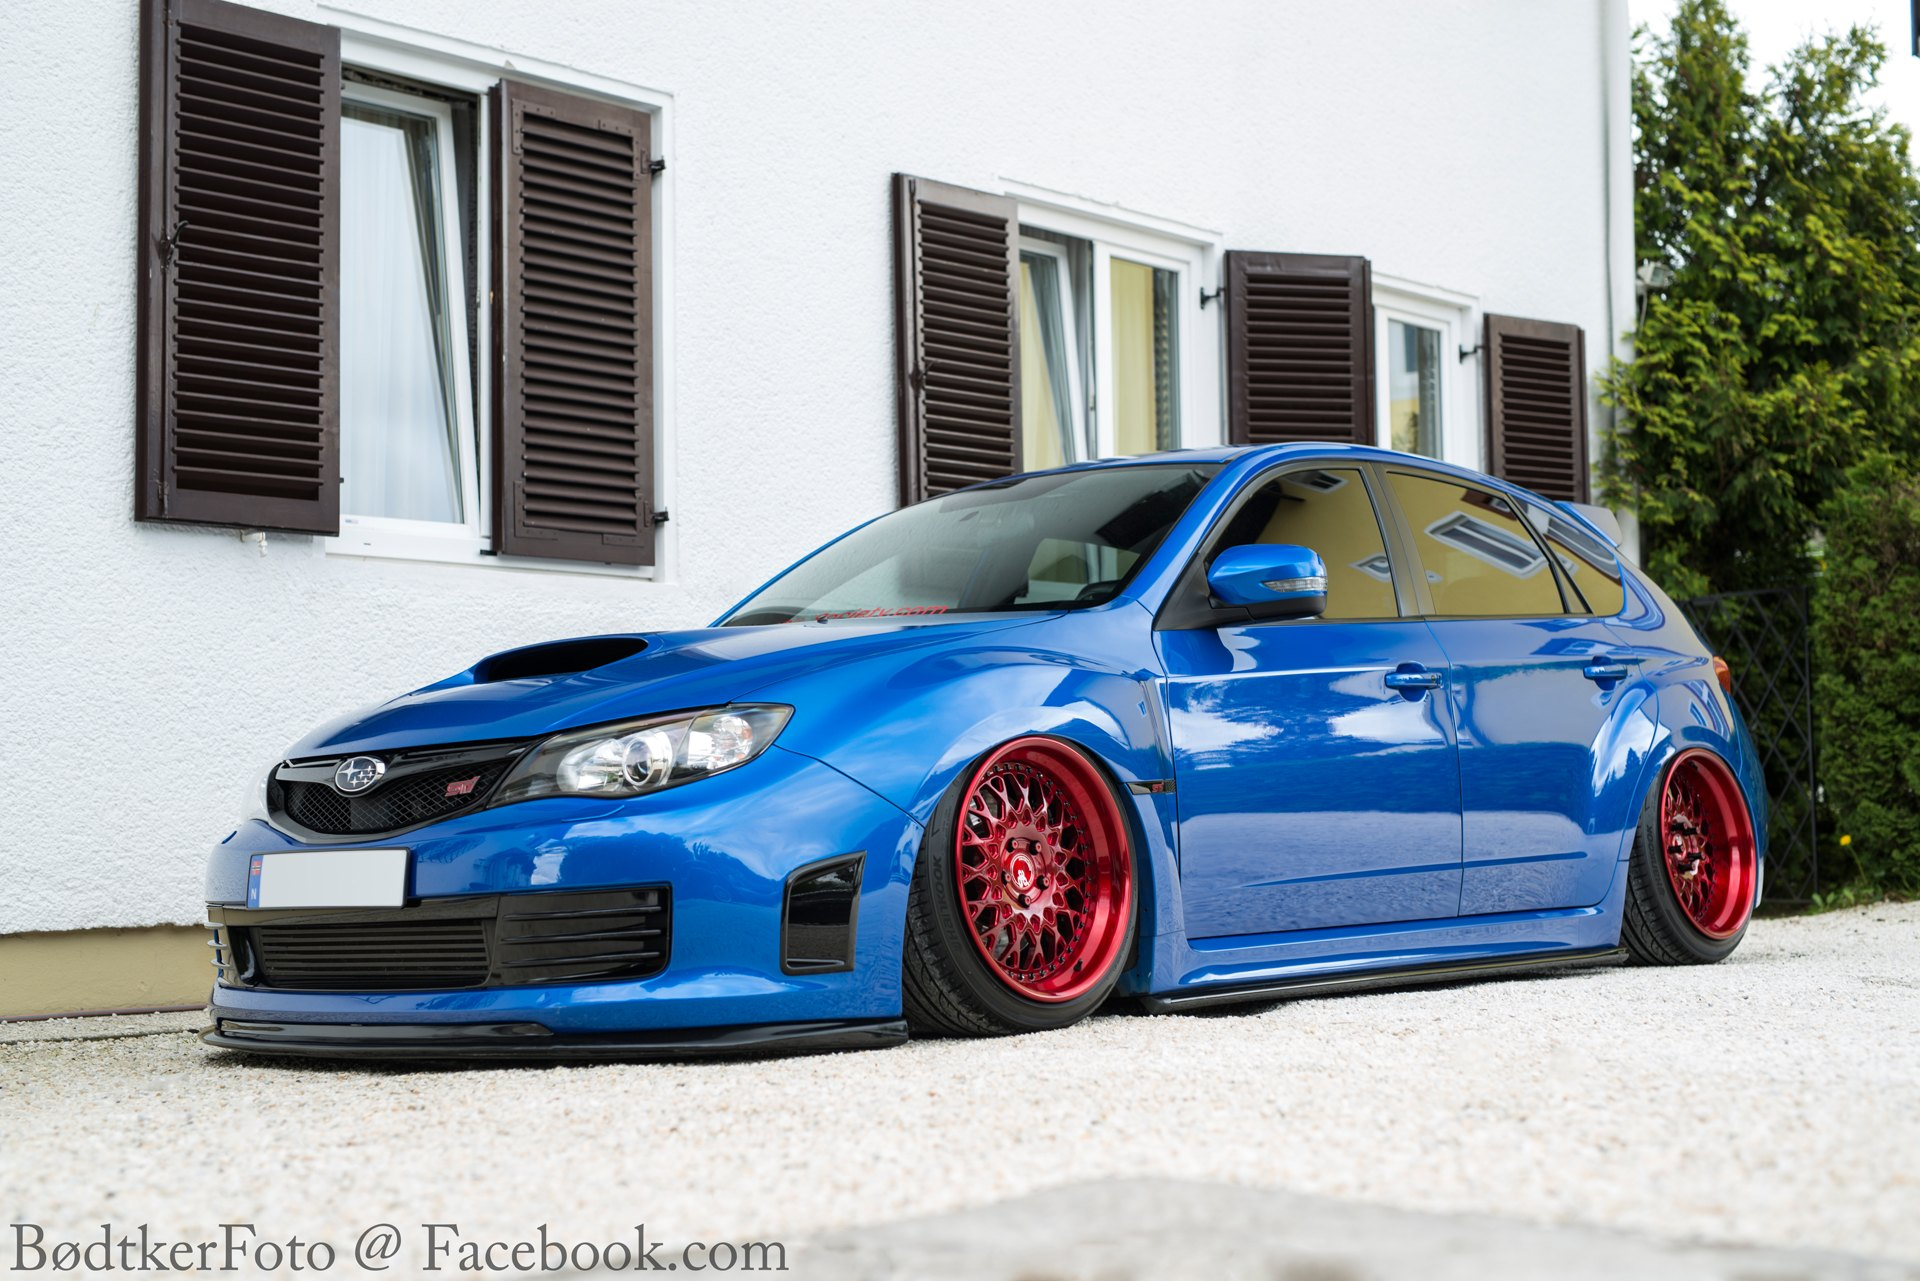 Aftermarket Hood on Blue Stanced Subaru WRX - Photo by Avant Garde Wheels